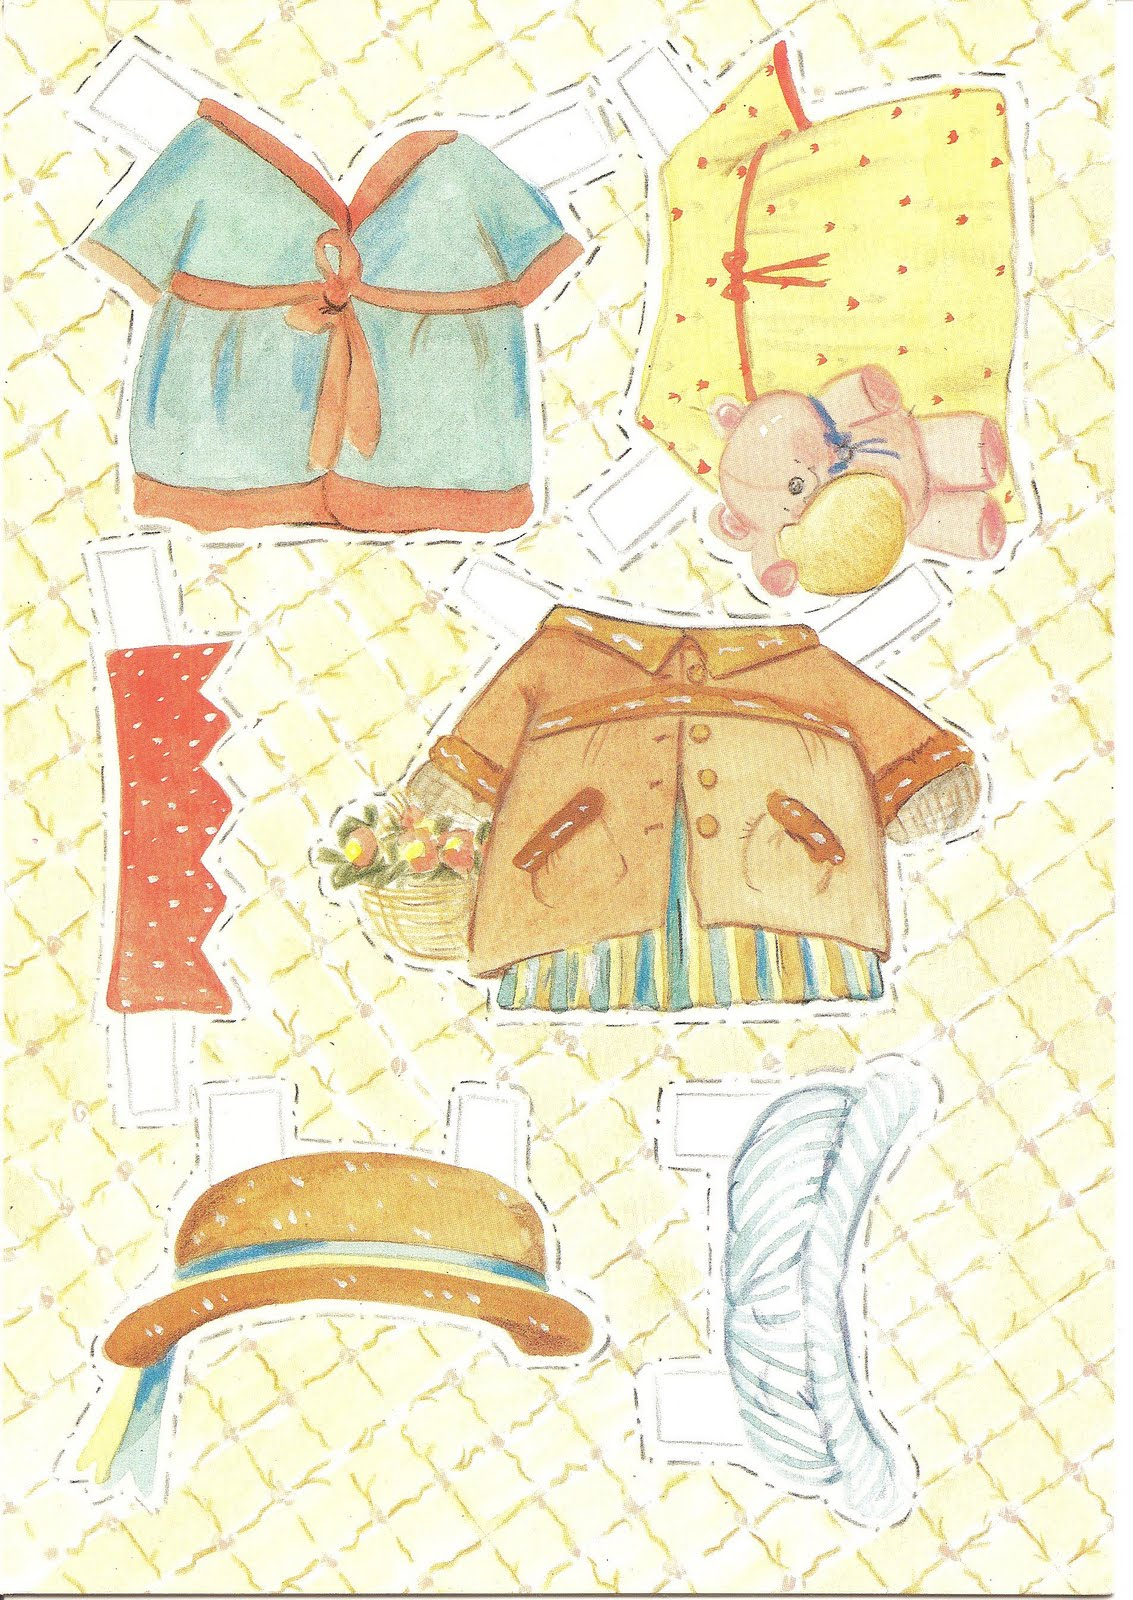 Mostly Paper Dolls: Birthday Card by Deborah Jones, 1988